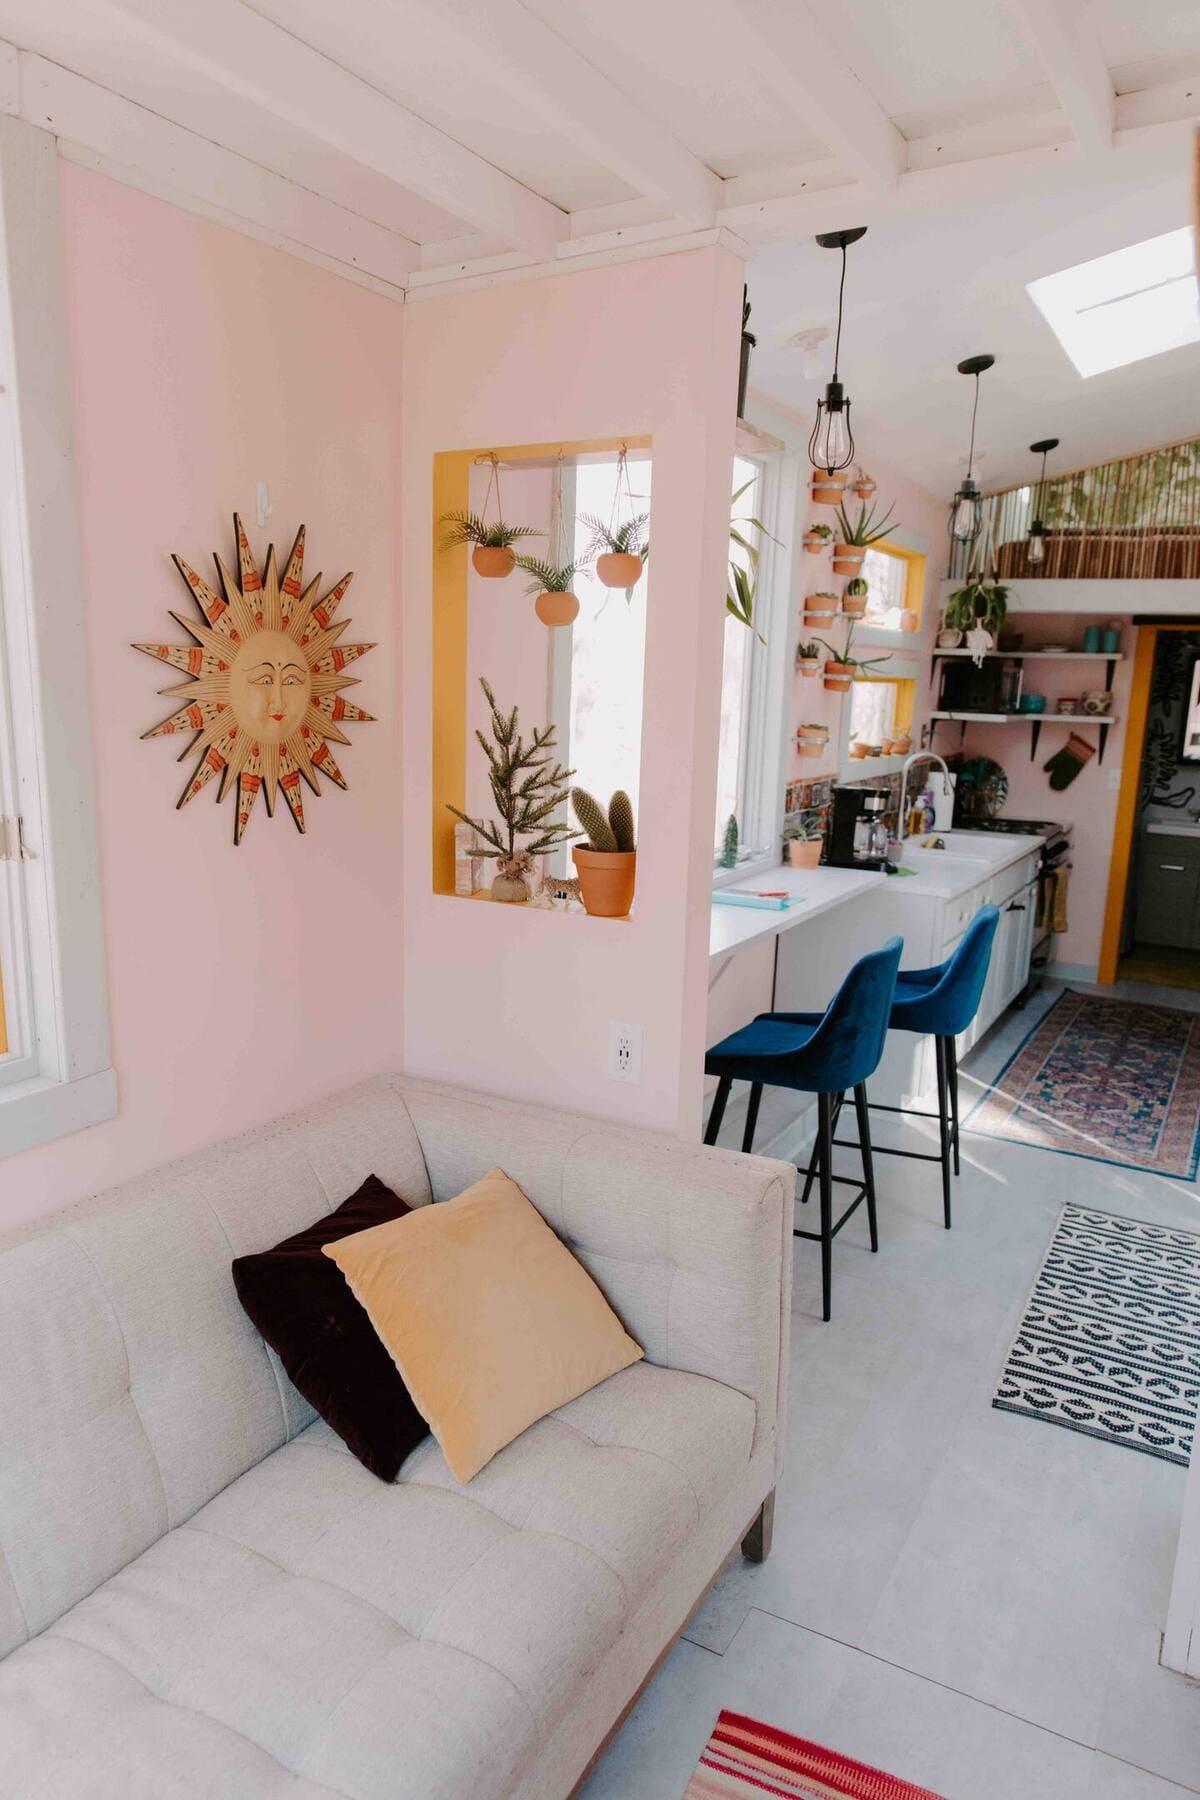 tiny house hola 13 - Tropical tiny house offers visitors a creative getaway